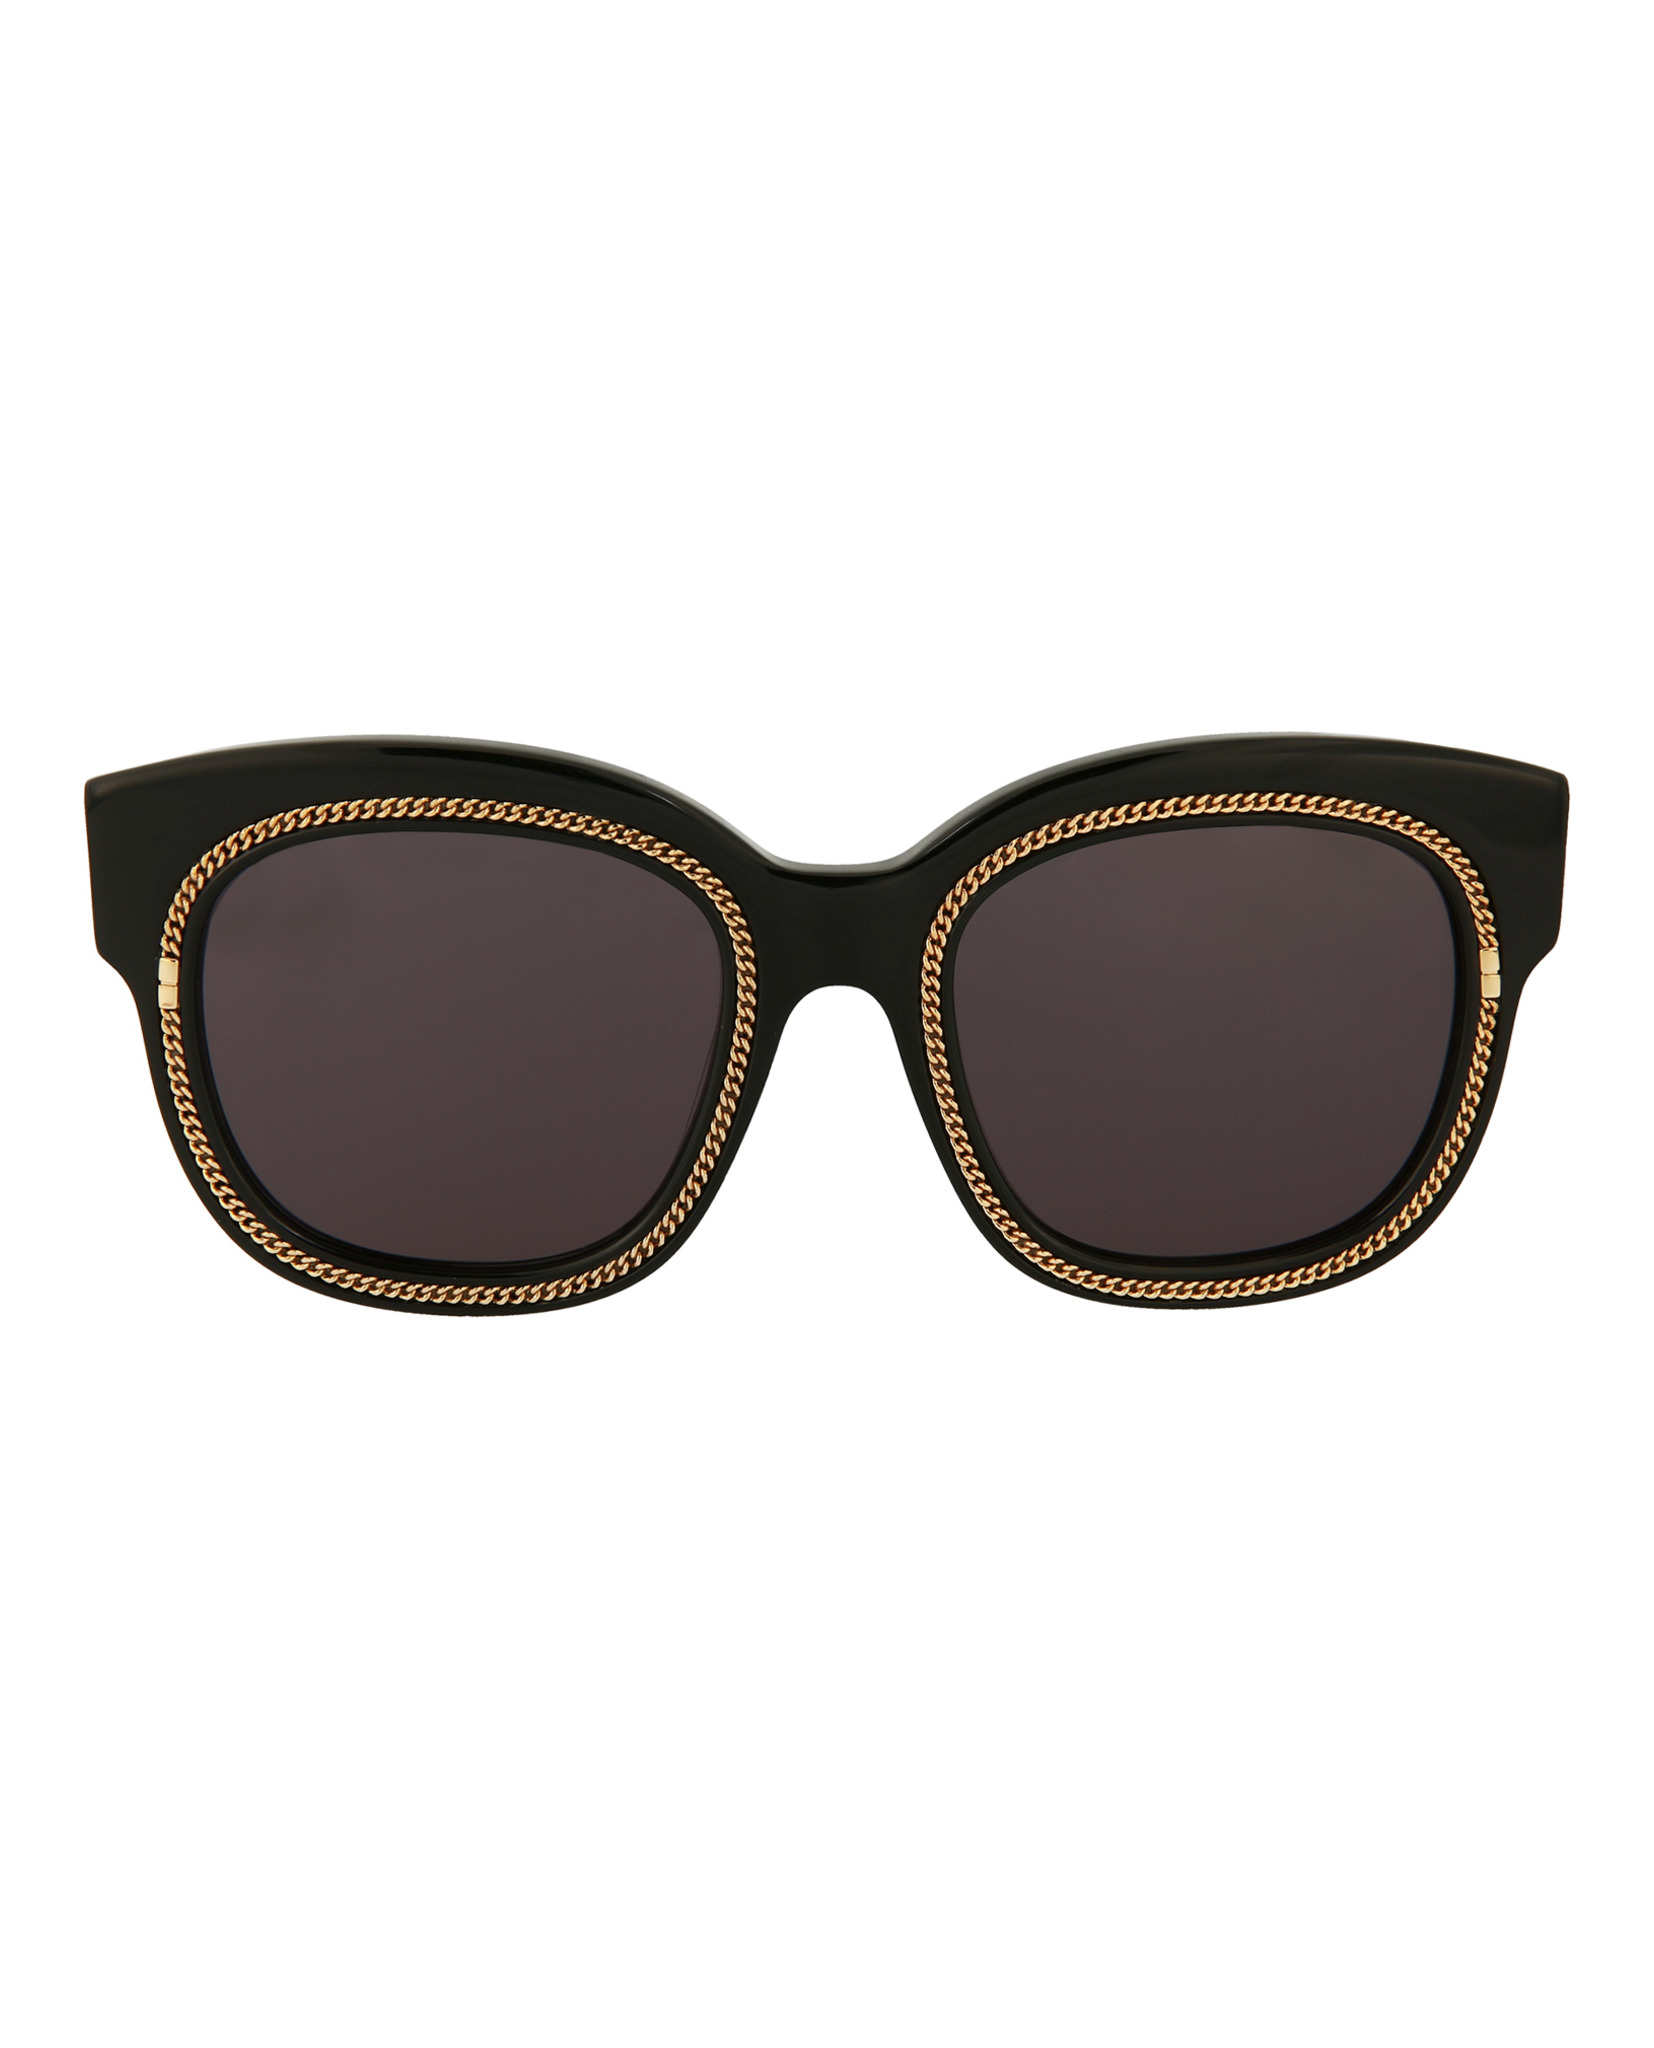 65898c81c82d Stella McCartney Womens Square Rectangle Sunglasses SC0041S-30000591 ...